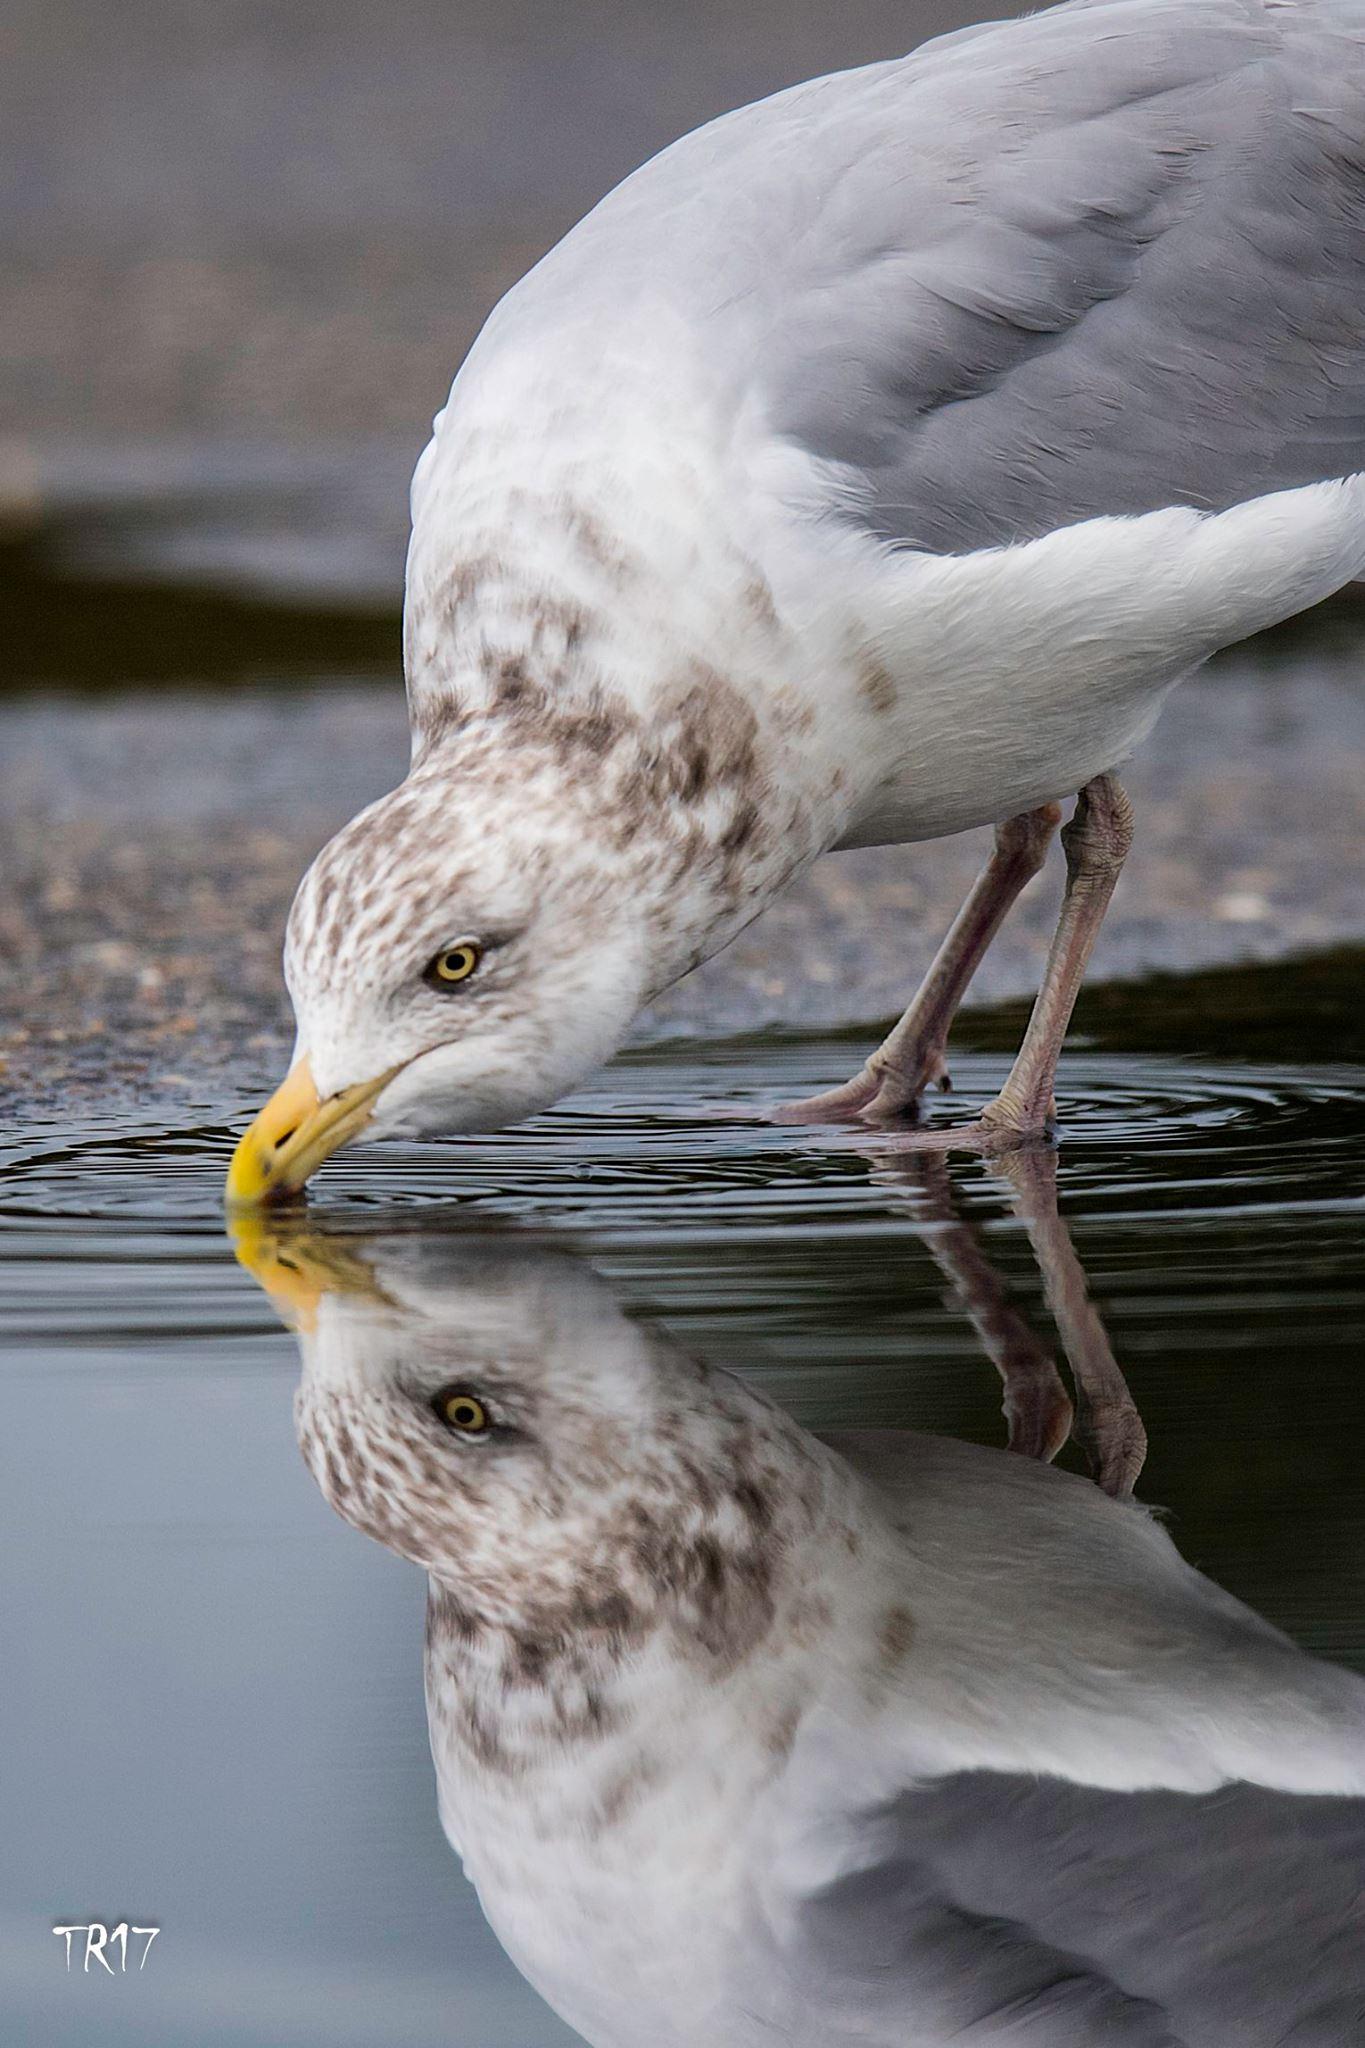 HERRING GULL IS ANOTHER OF LONG ISLAND'S RESIDENT AVIAN SPECIES. IMAGE: TOM REICHERT